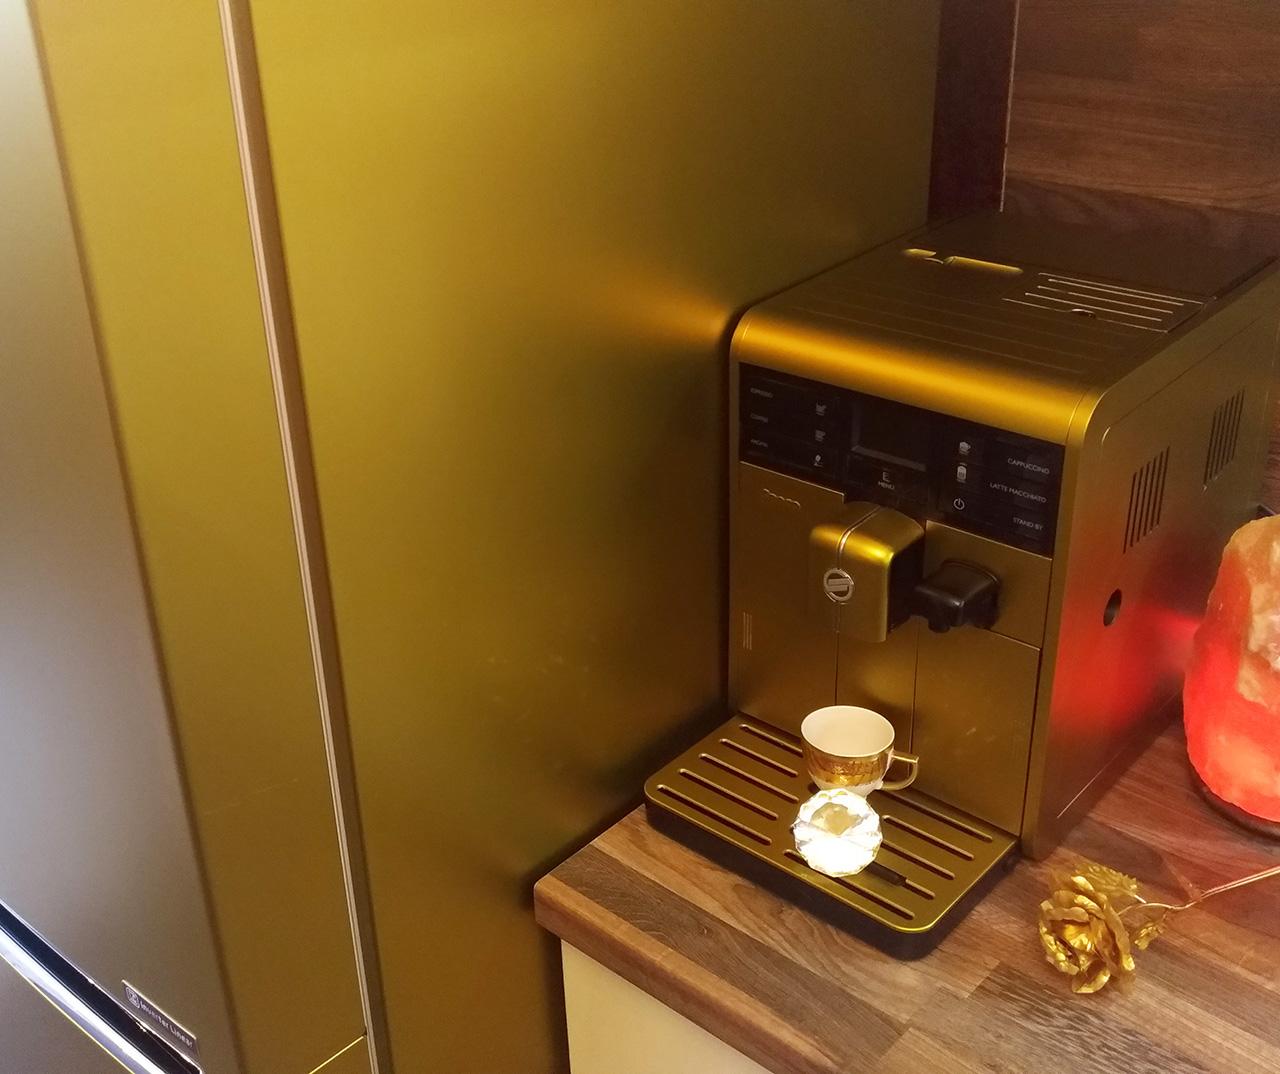 хладилник и кафемашина фолирани със златен сатен